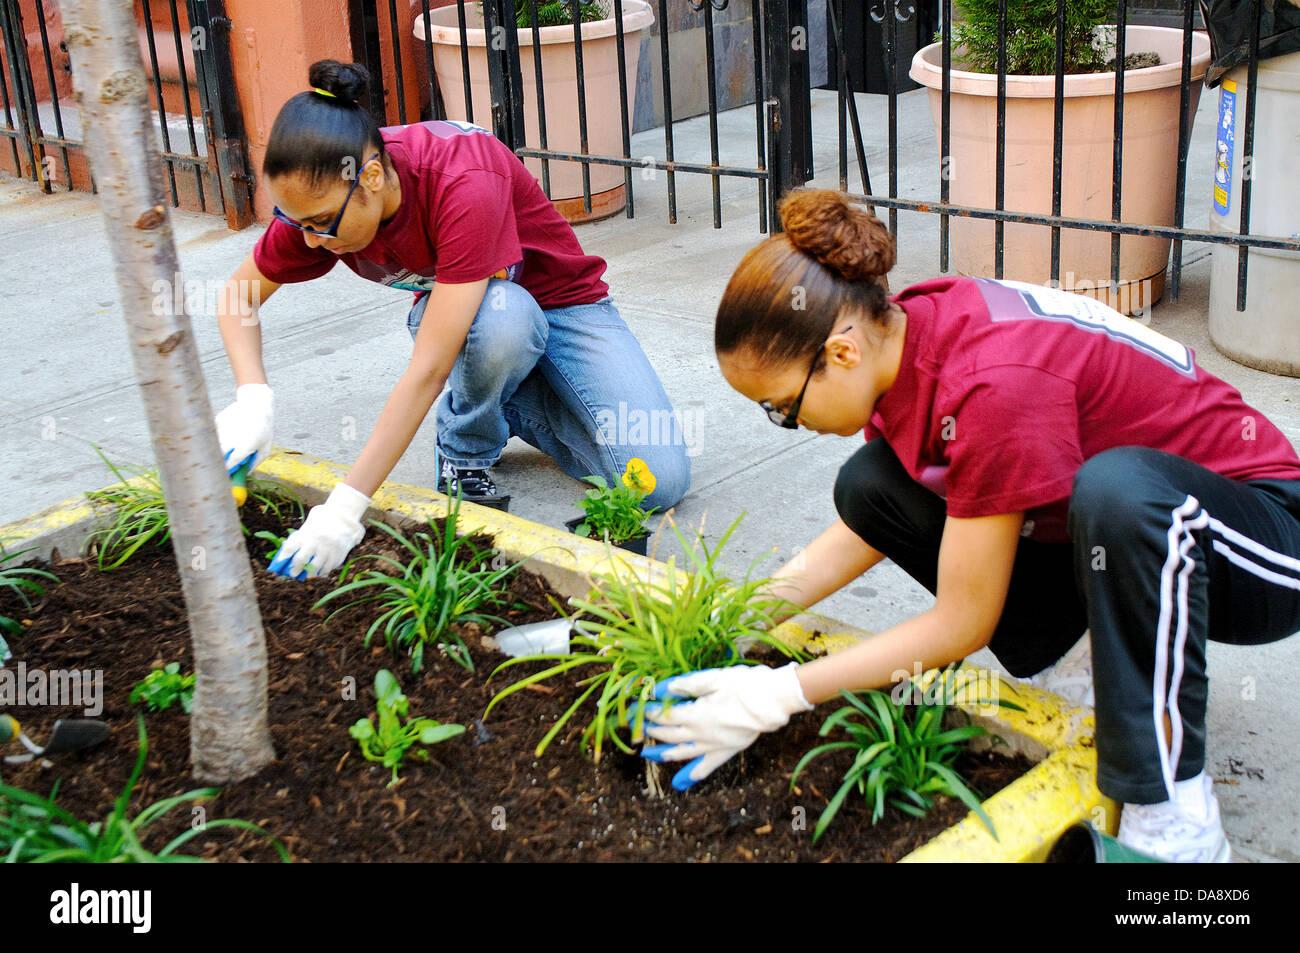 Hispanic community service volunteers - Stock Image